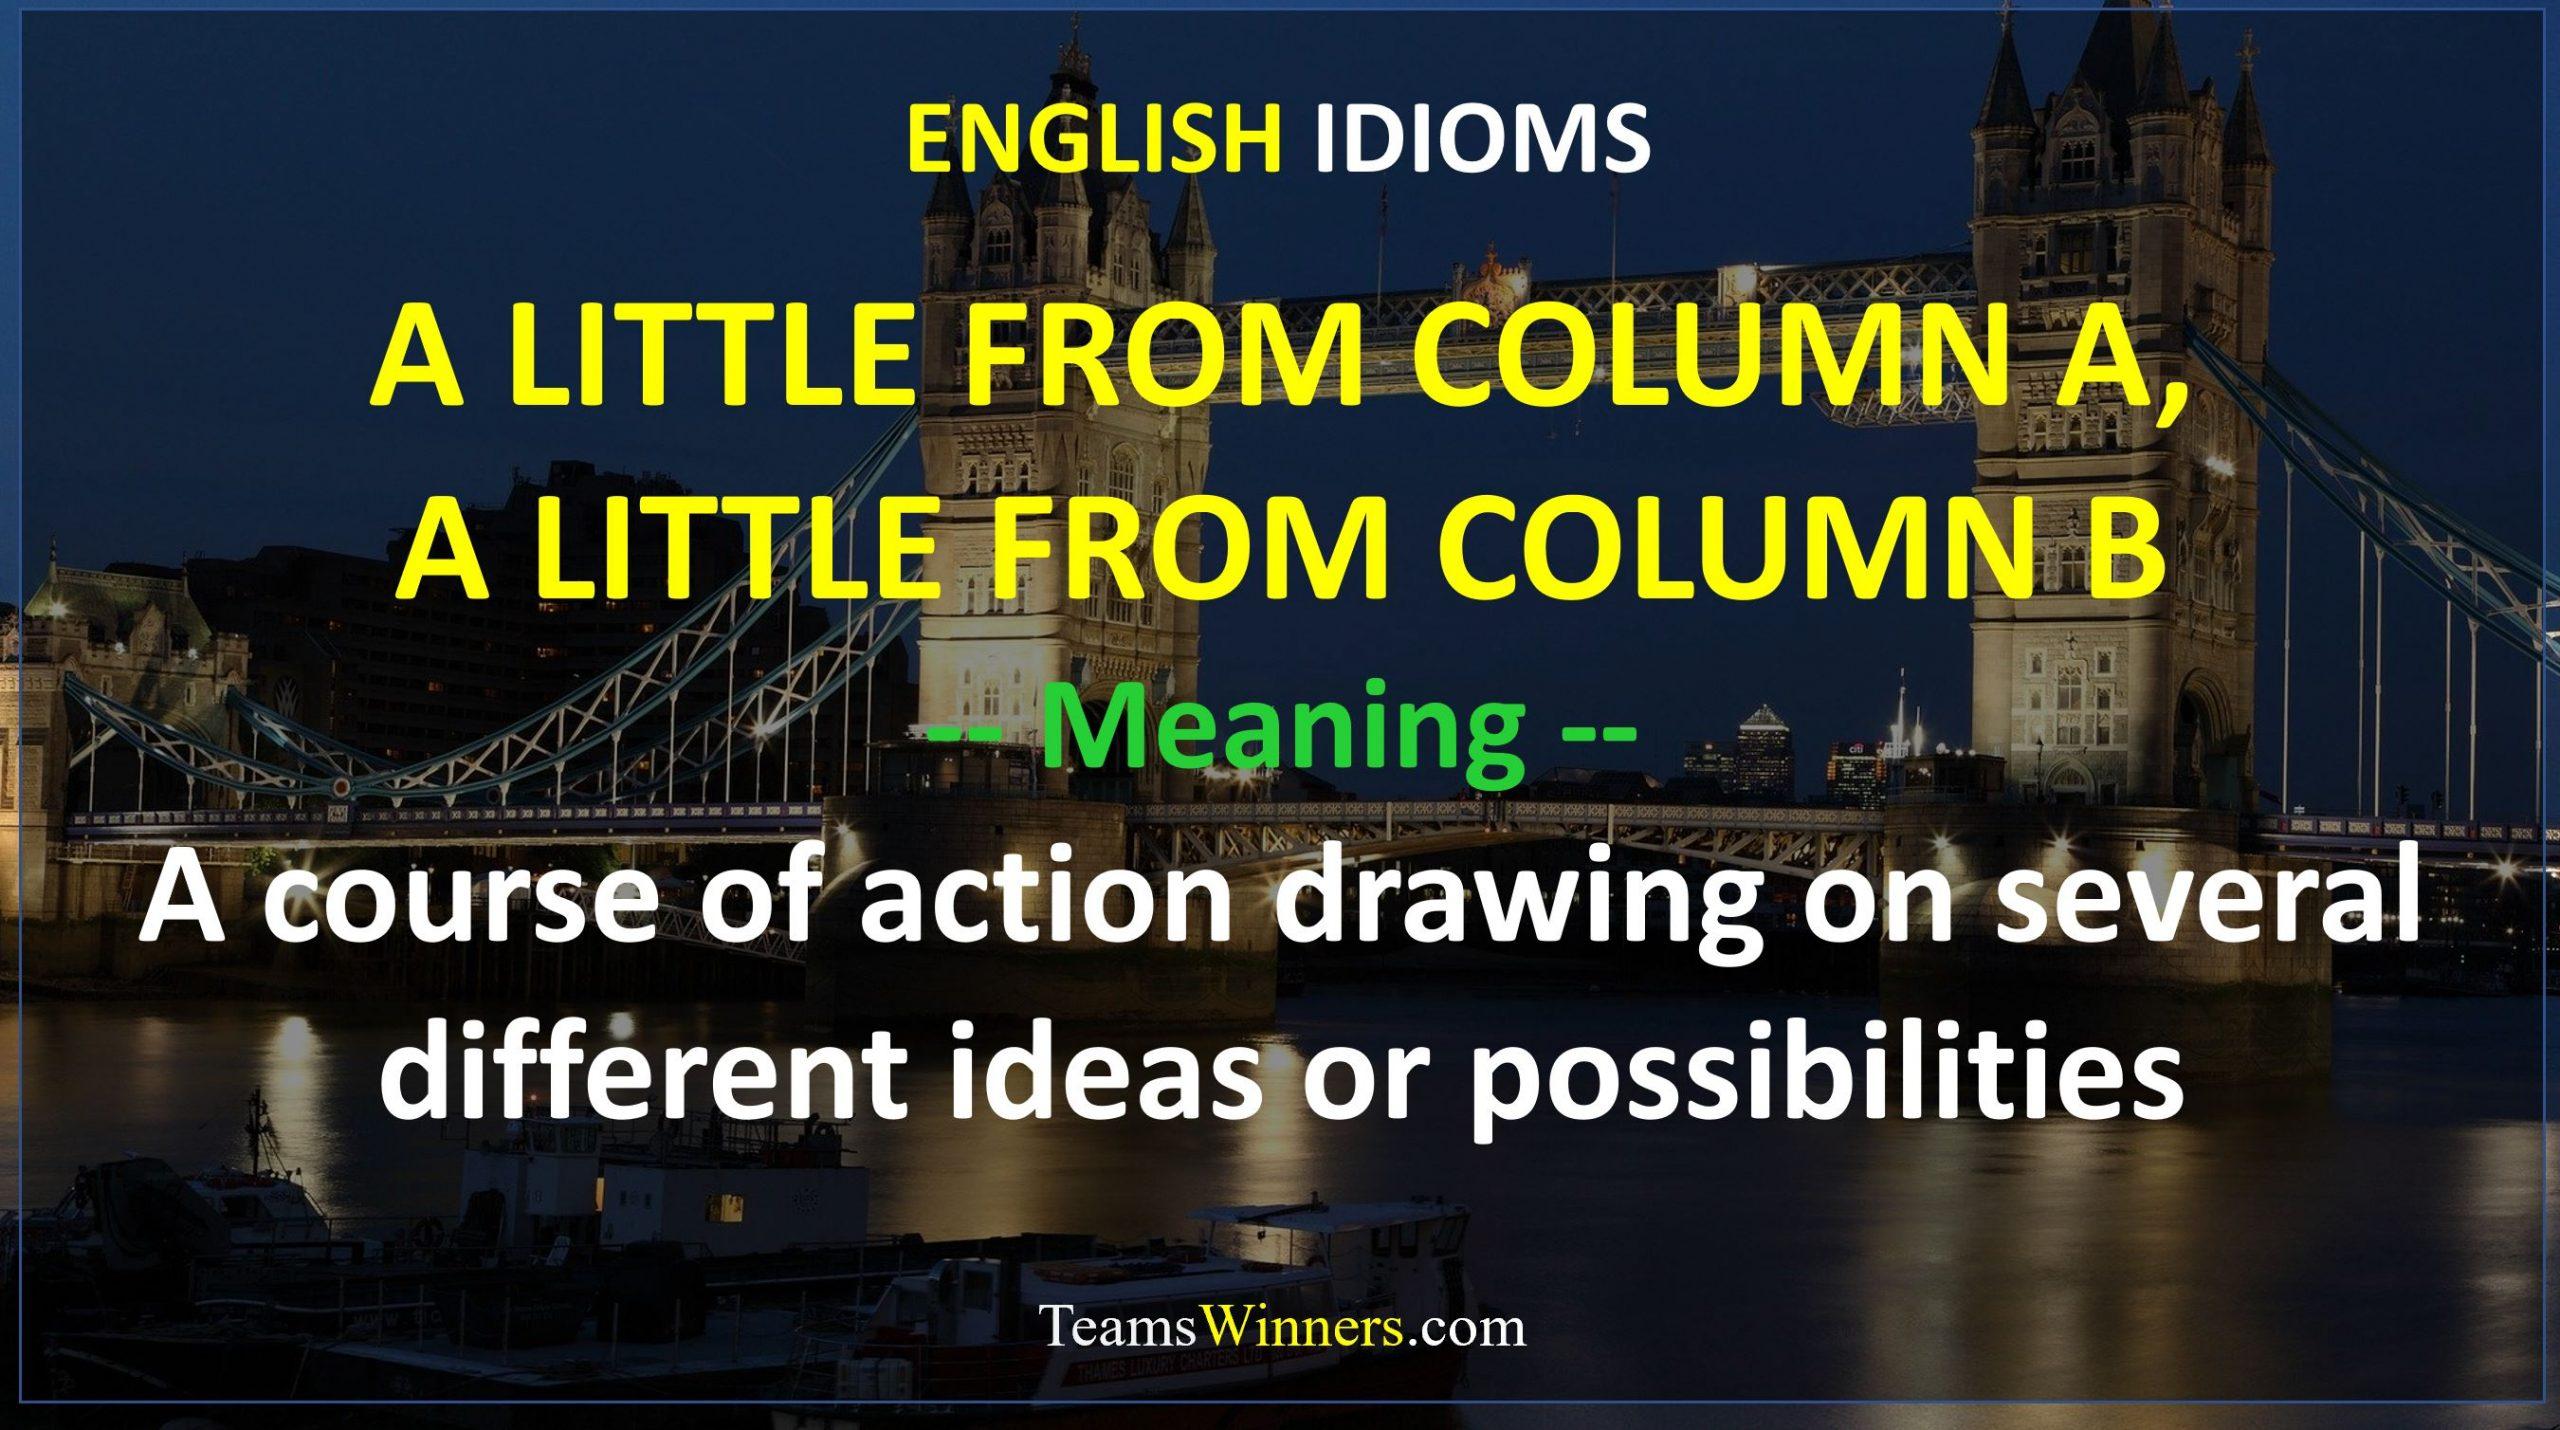 English Idiom - A Little From Column A